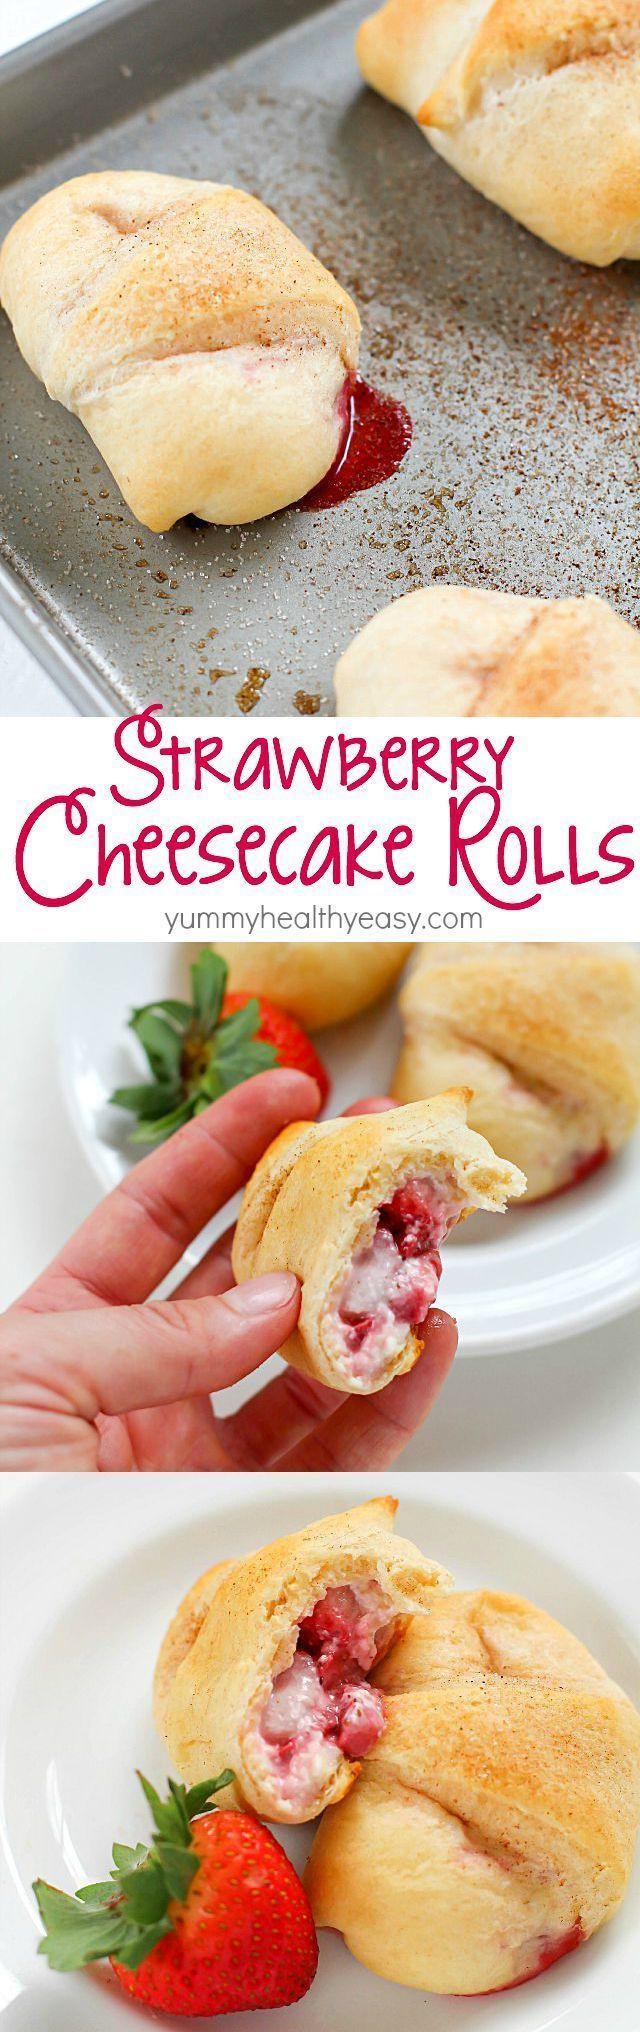 Cream Cheese Crescent Roll Dessert  crescent roll dessert recipes with cream cheese